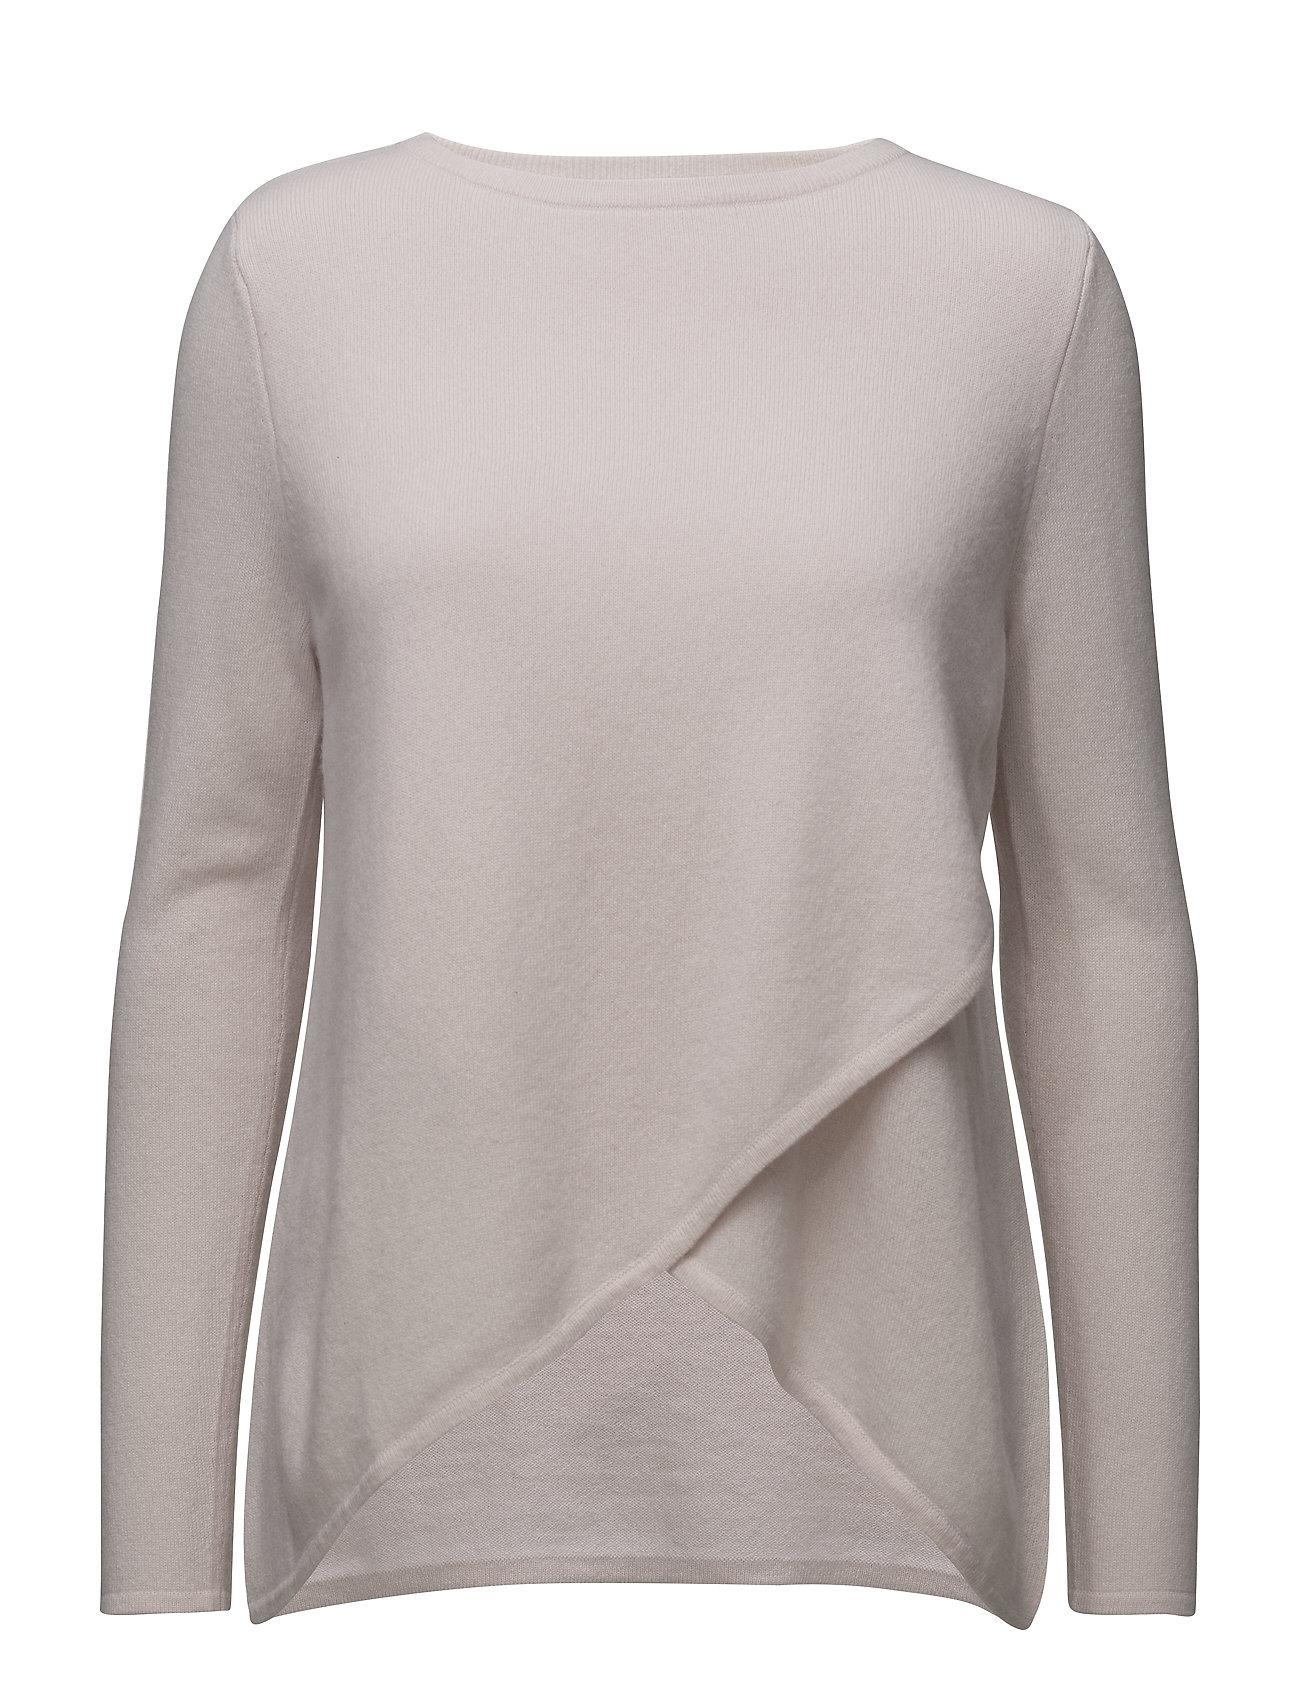 Davida Cashmere Wrap Front Sweater - LIGHT PINK